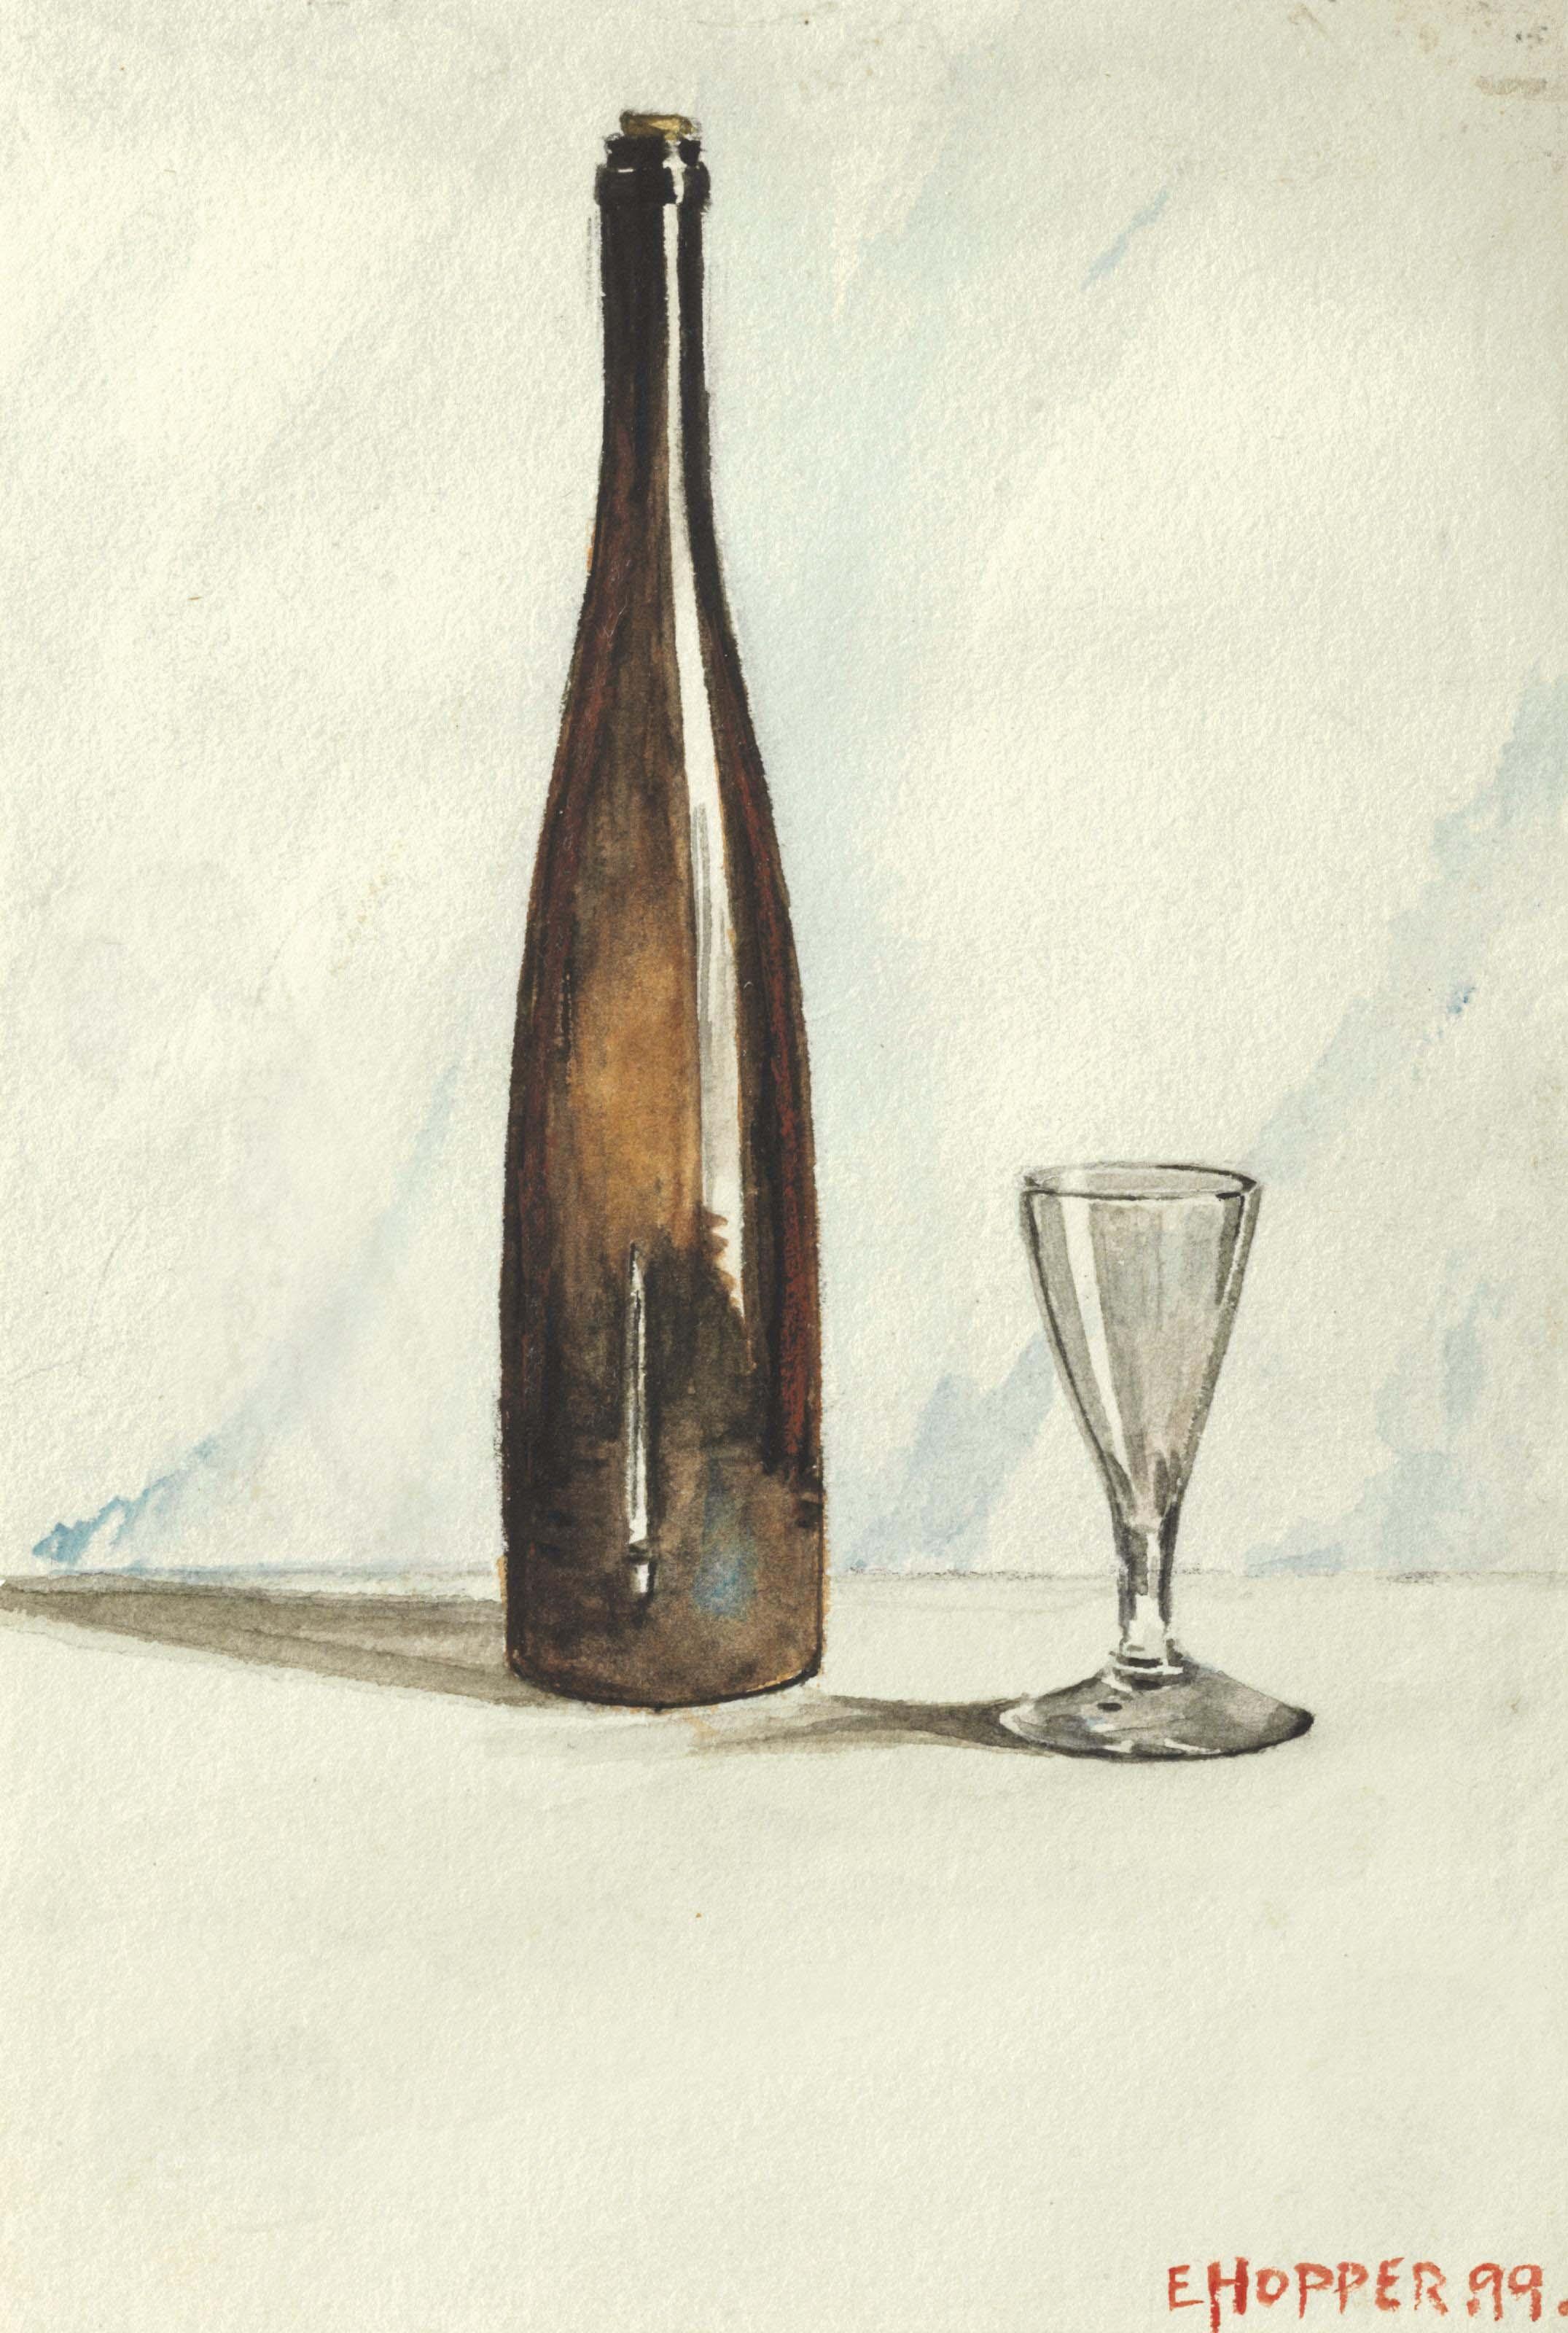 """Bodegón con botella de vino y vaso"" (1899), de Edward Hopper"